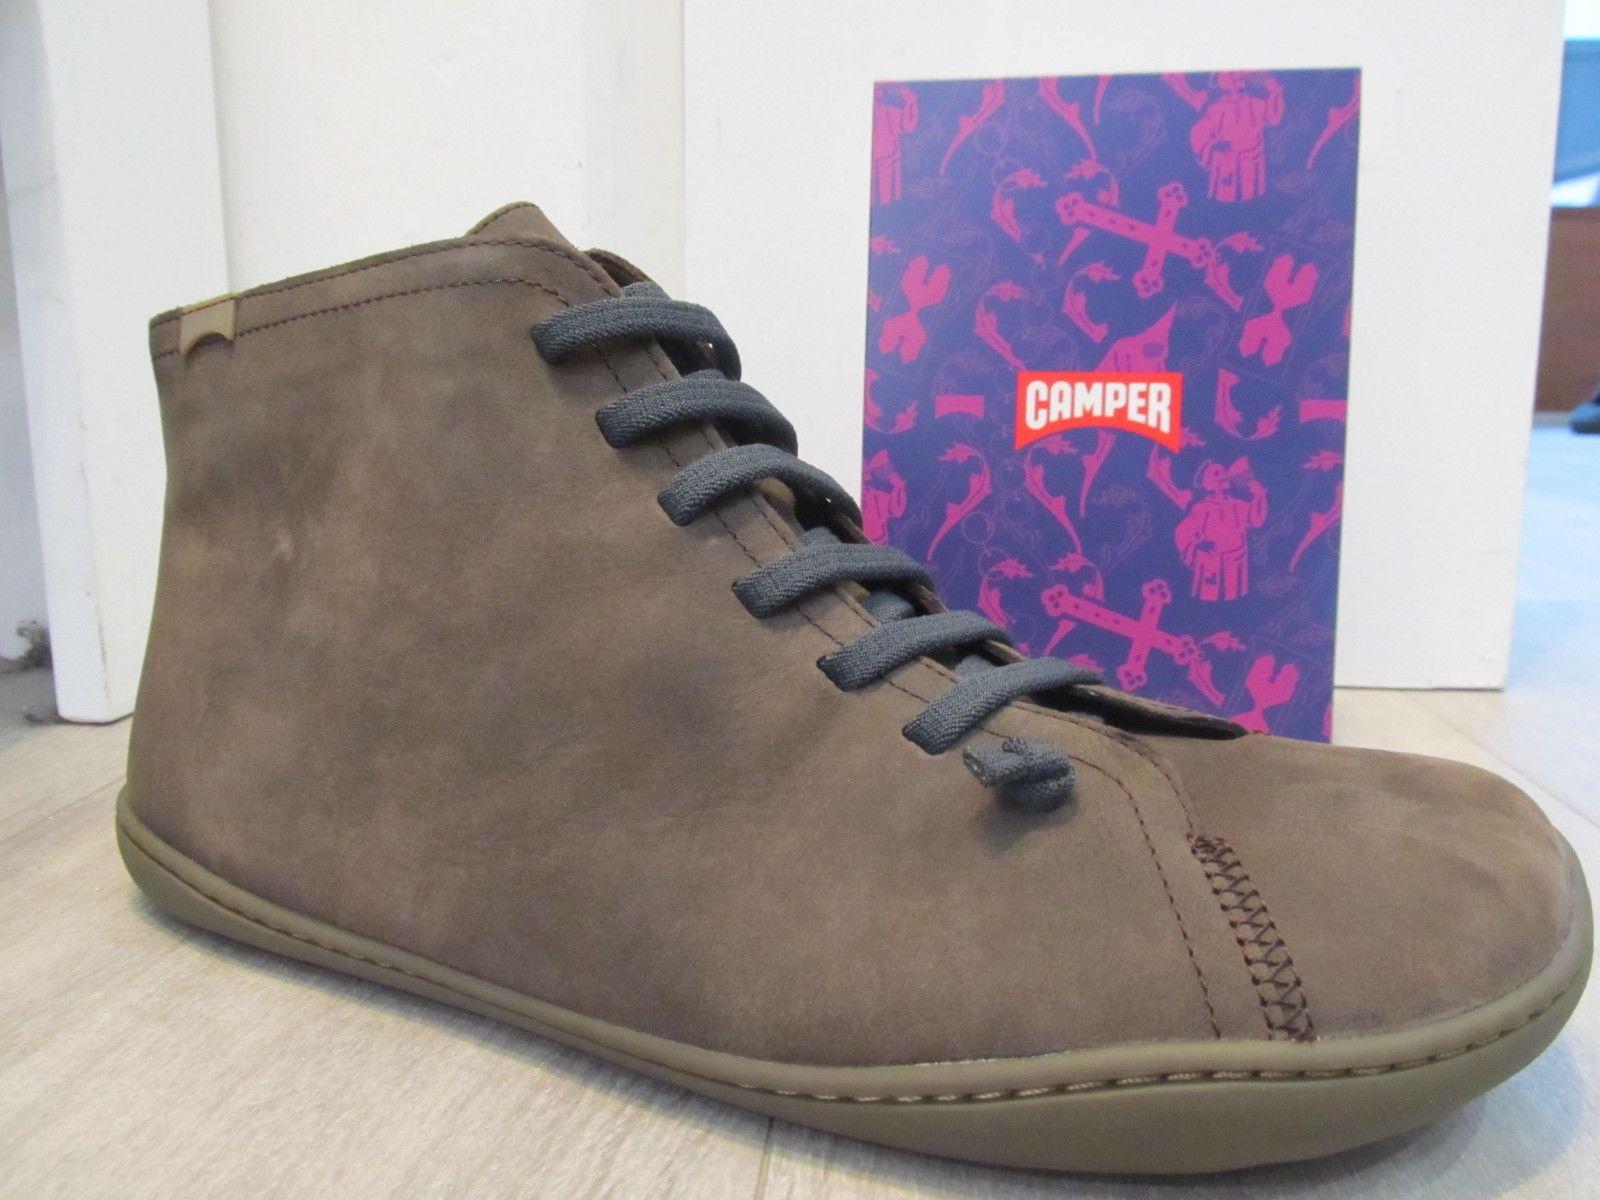 5e9d6c59 Camper Peu Cami 36458-032 Brown Leather Zip Elastic Trim Mens Ankle ...